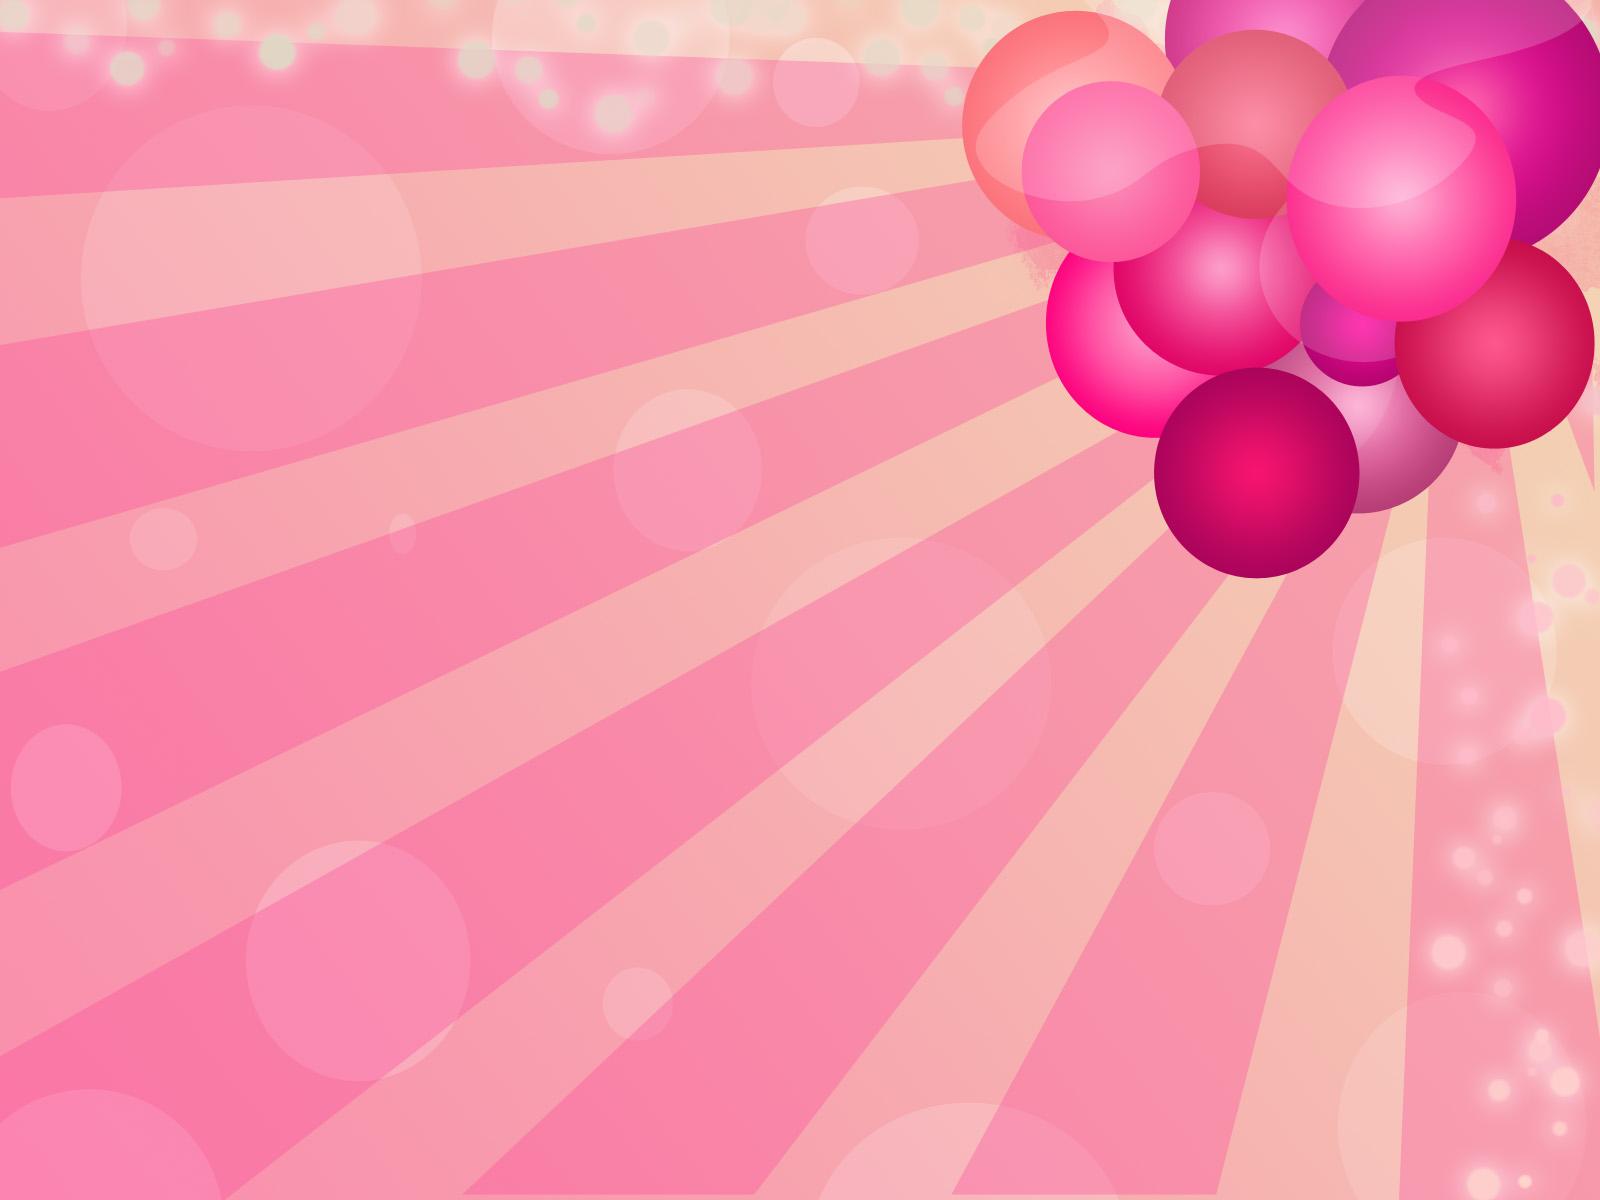 Cute Pink Wallpaper HD Background 1600x1200